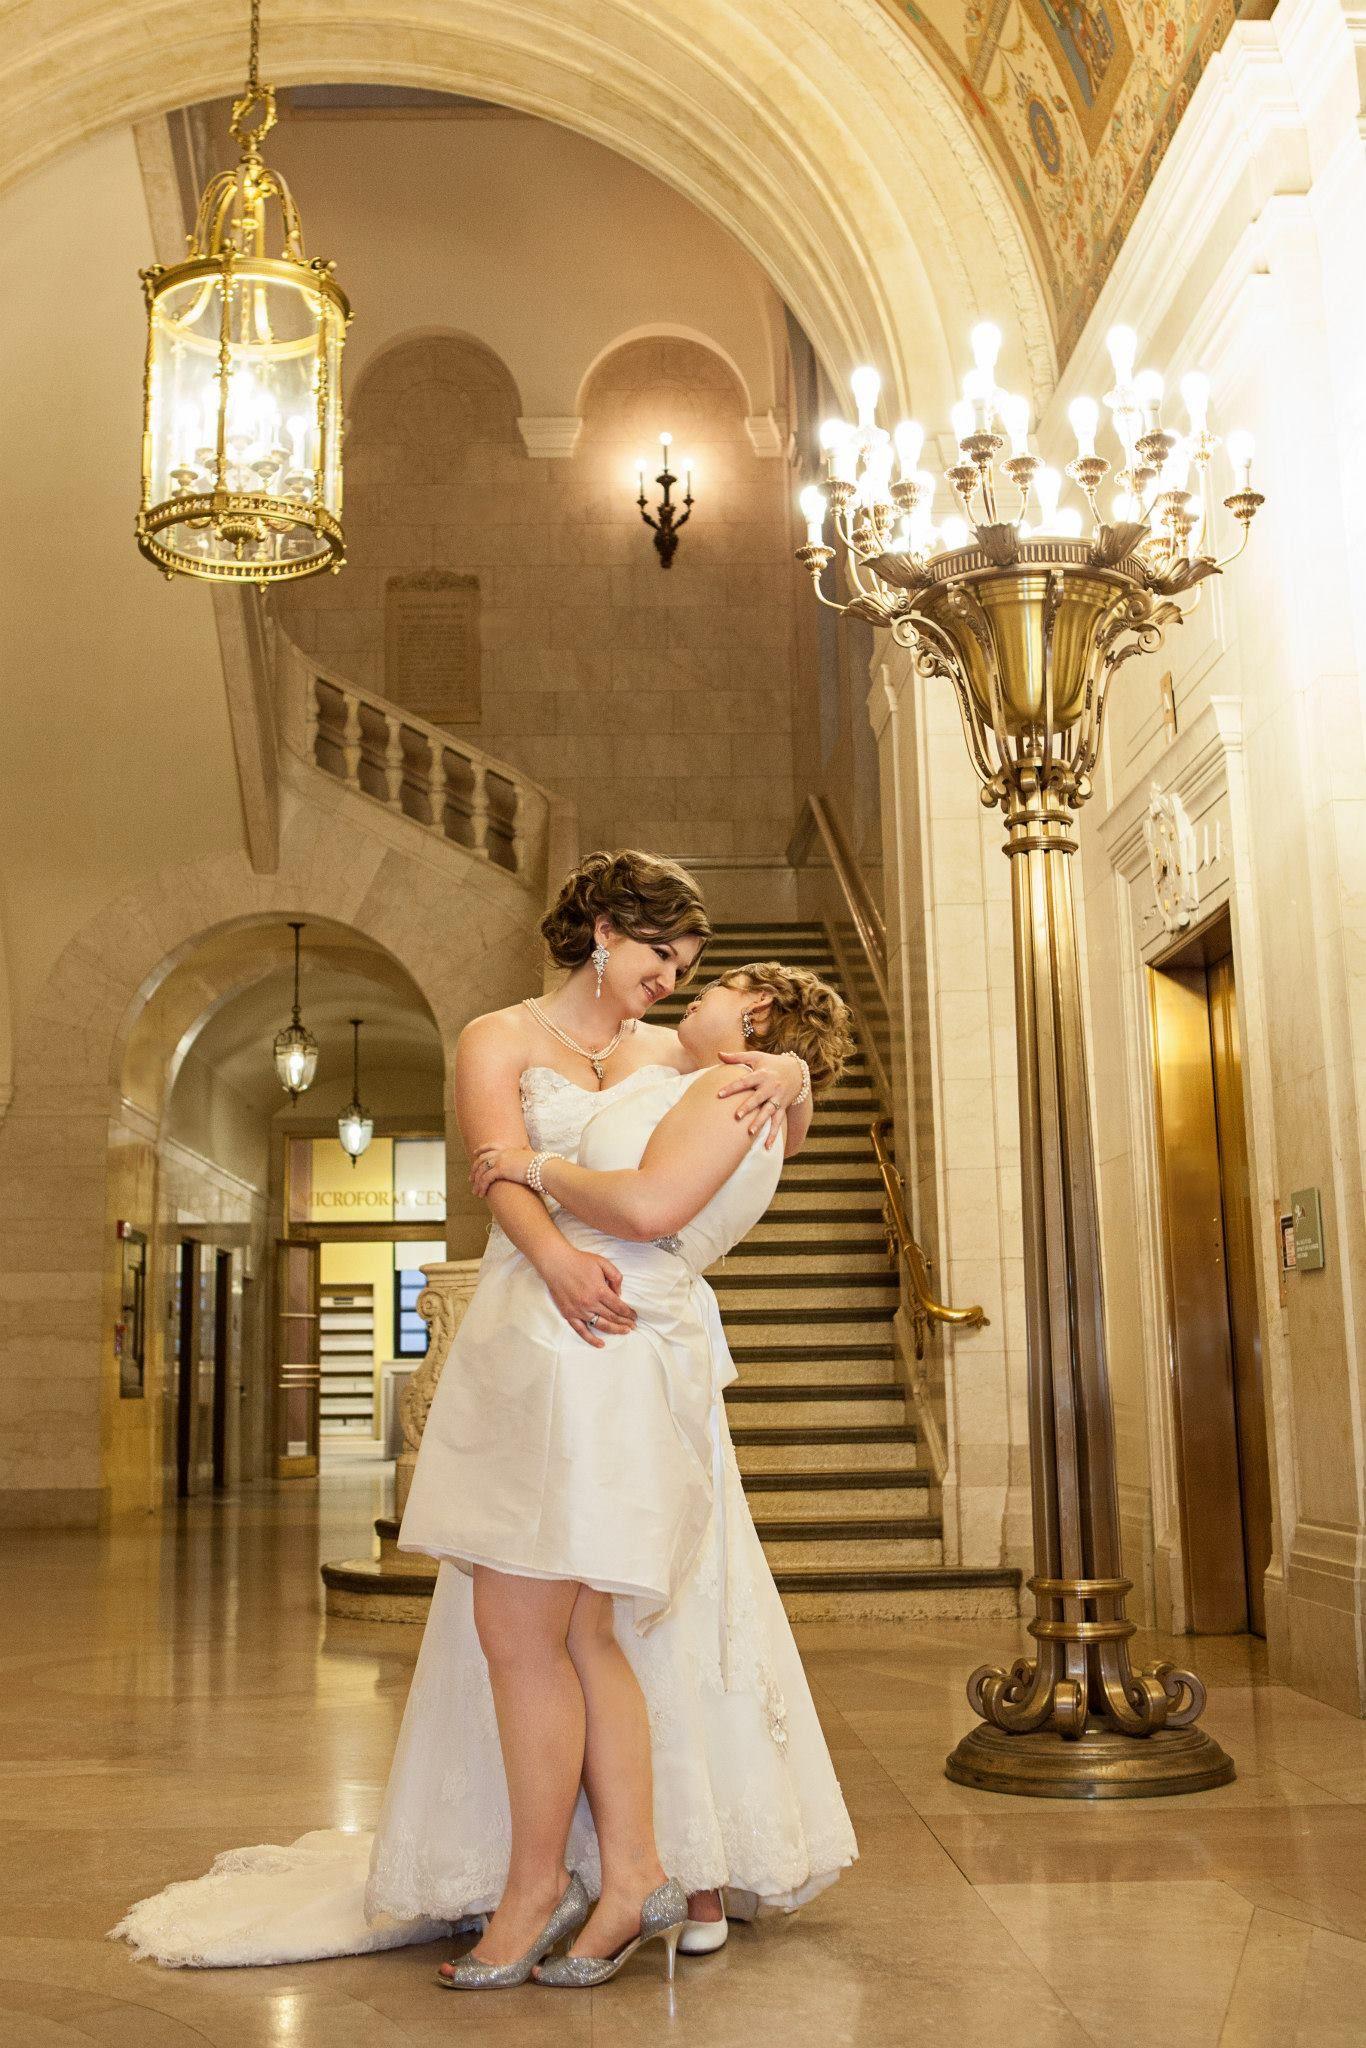 Wedding: Alexis & Corinne